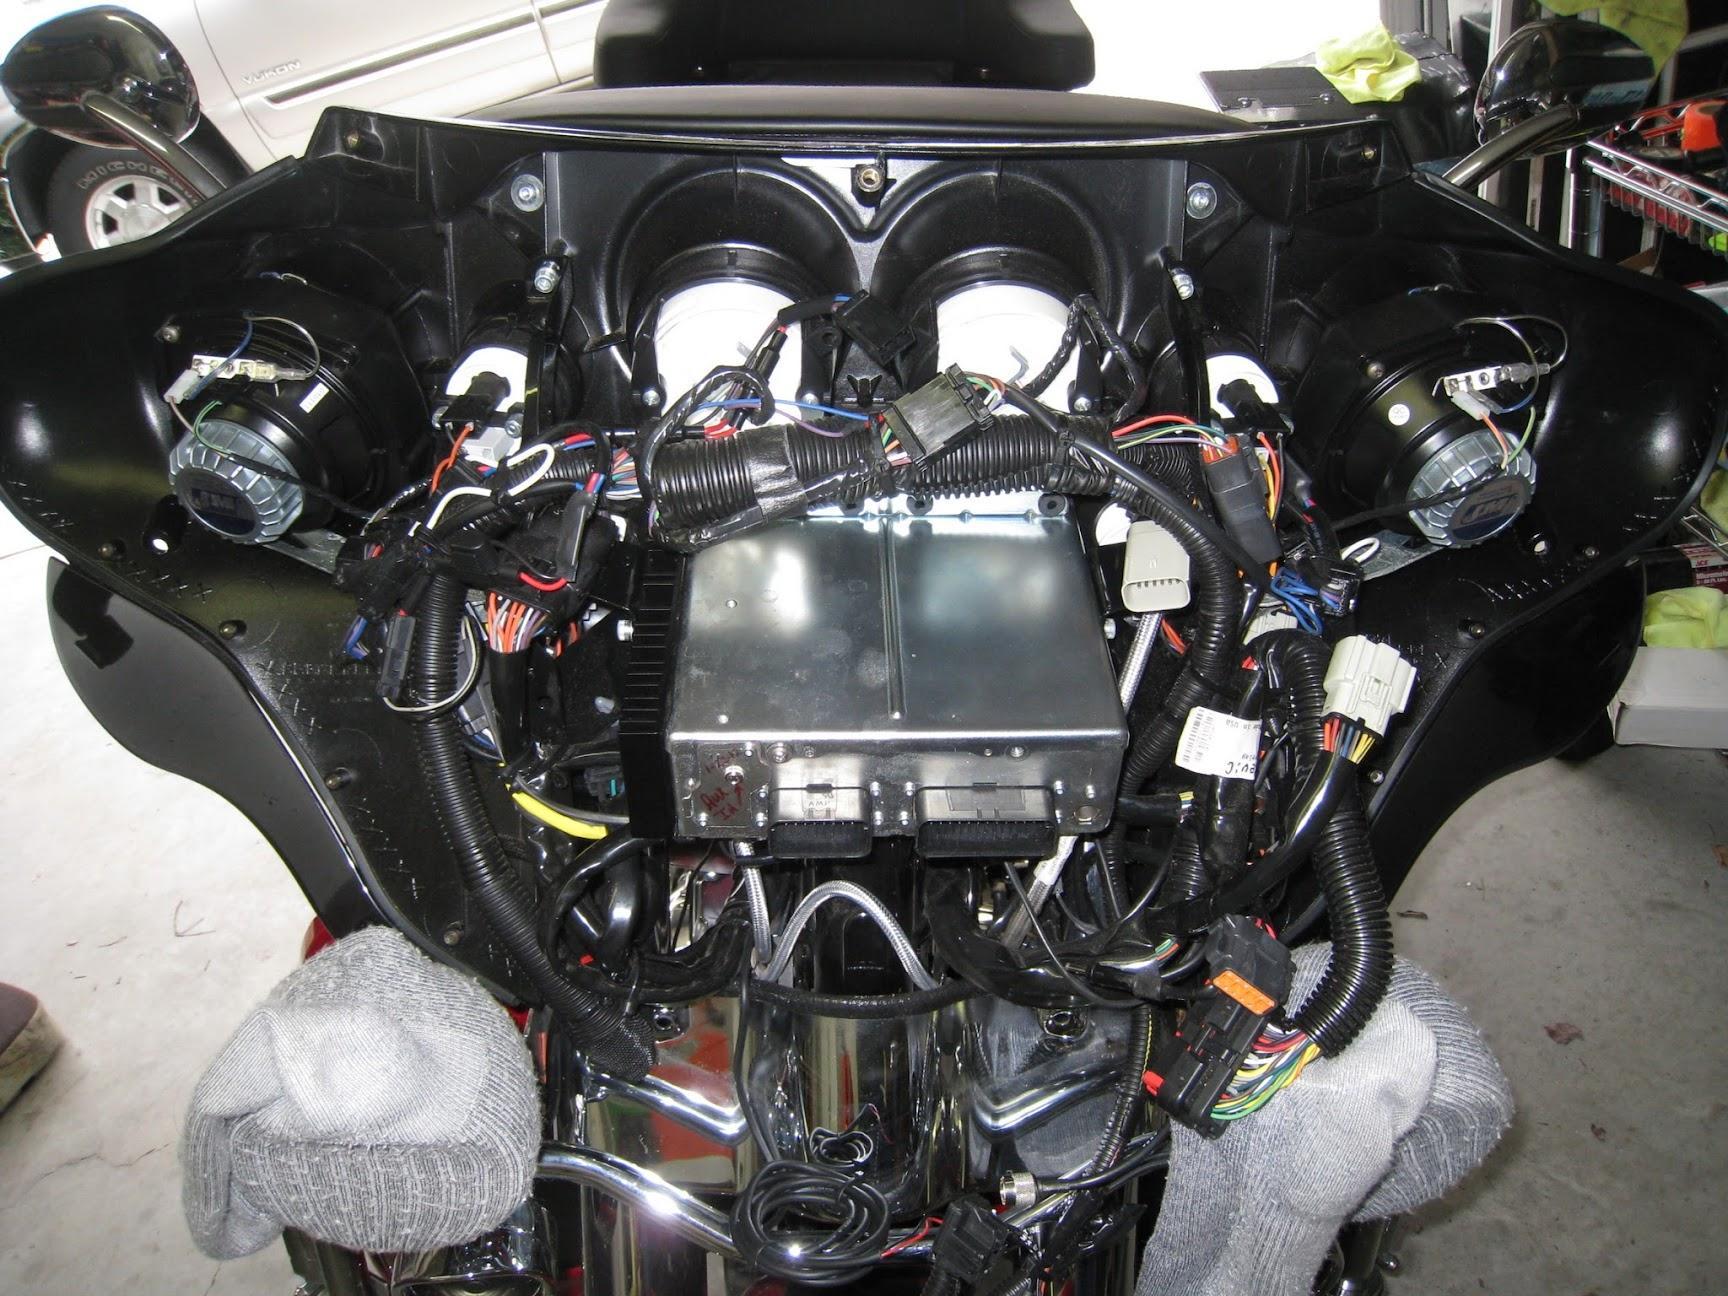 IMG_0089 Harley Headlight Wiring Diagram on